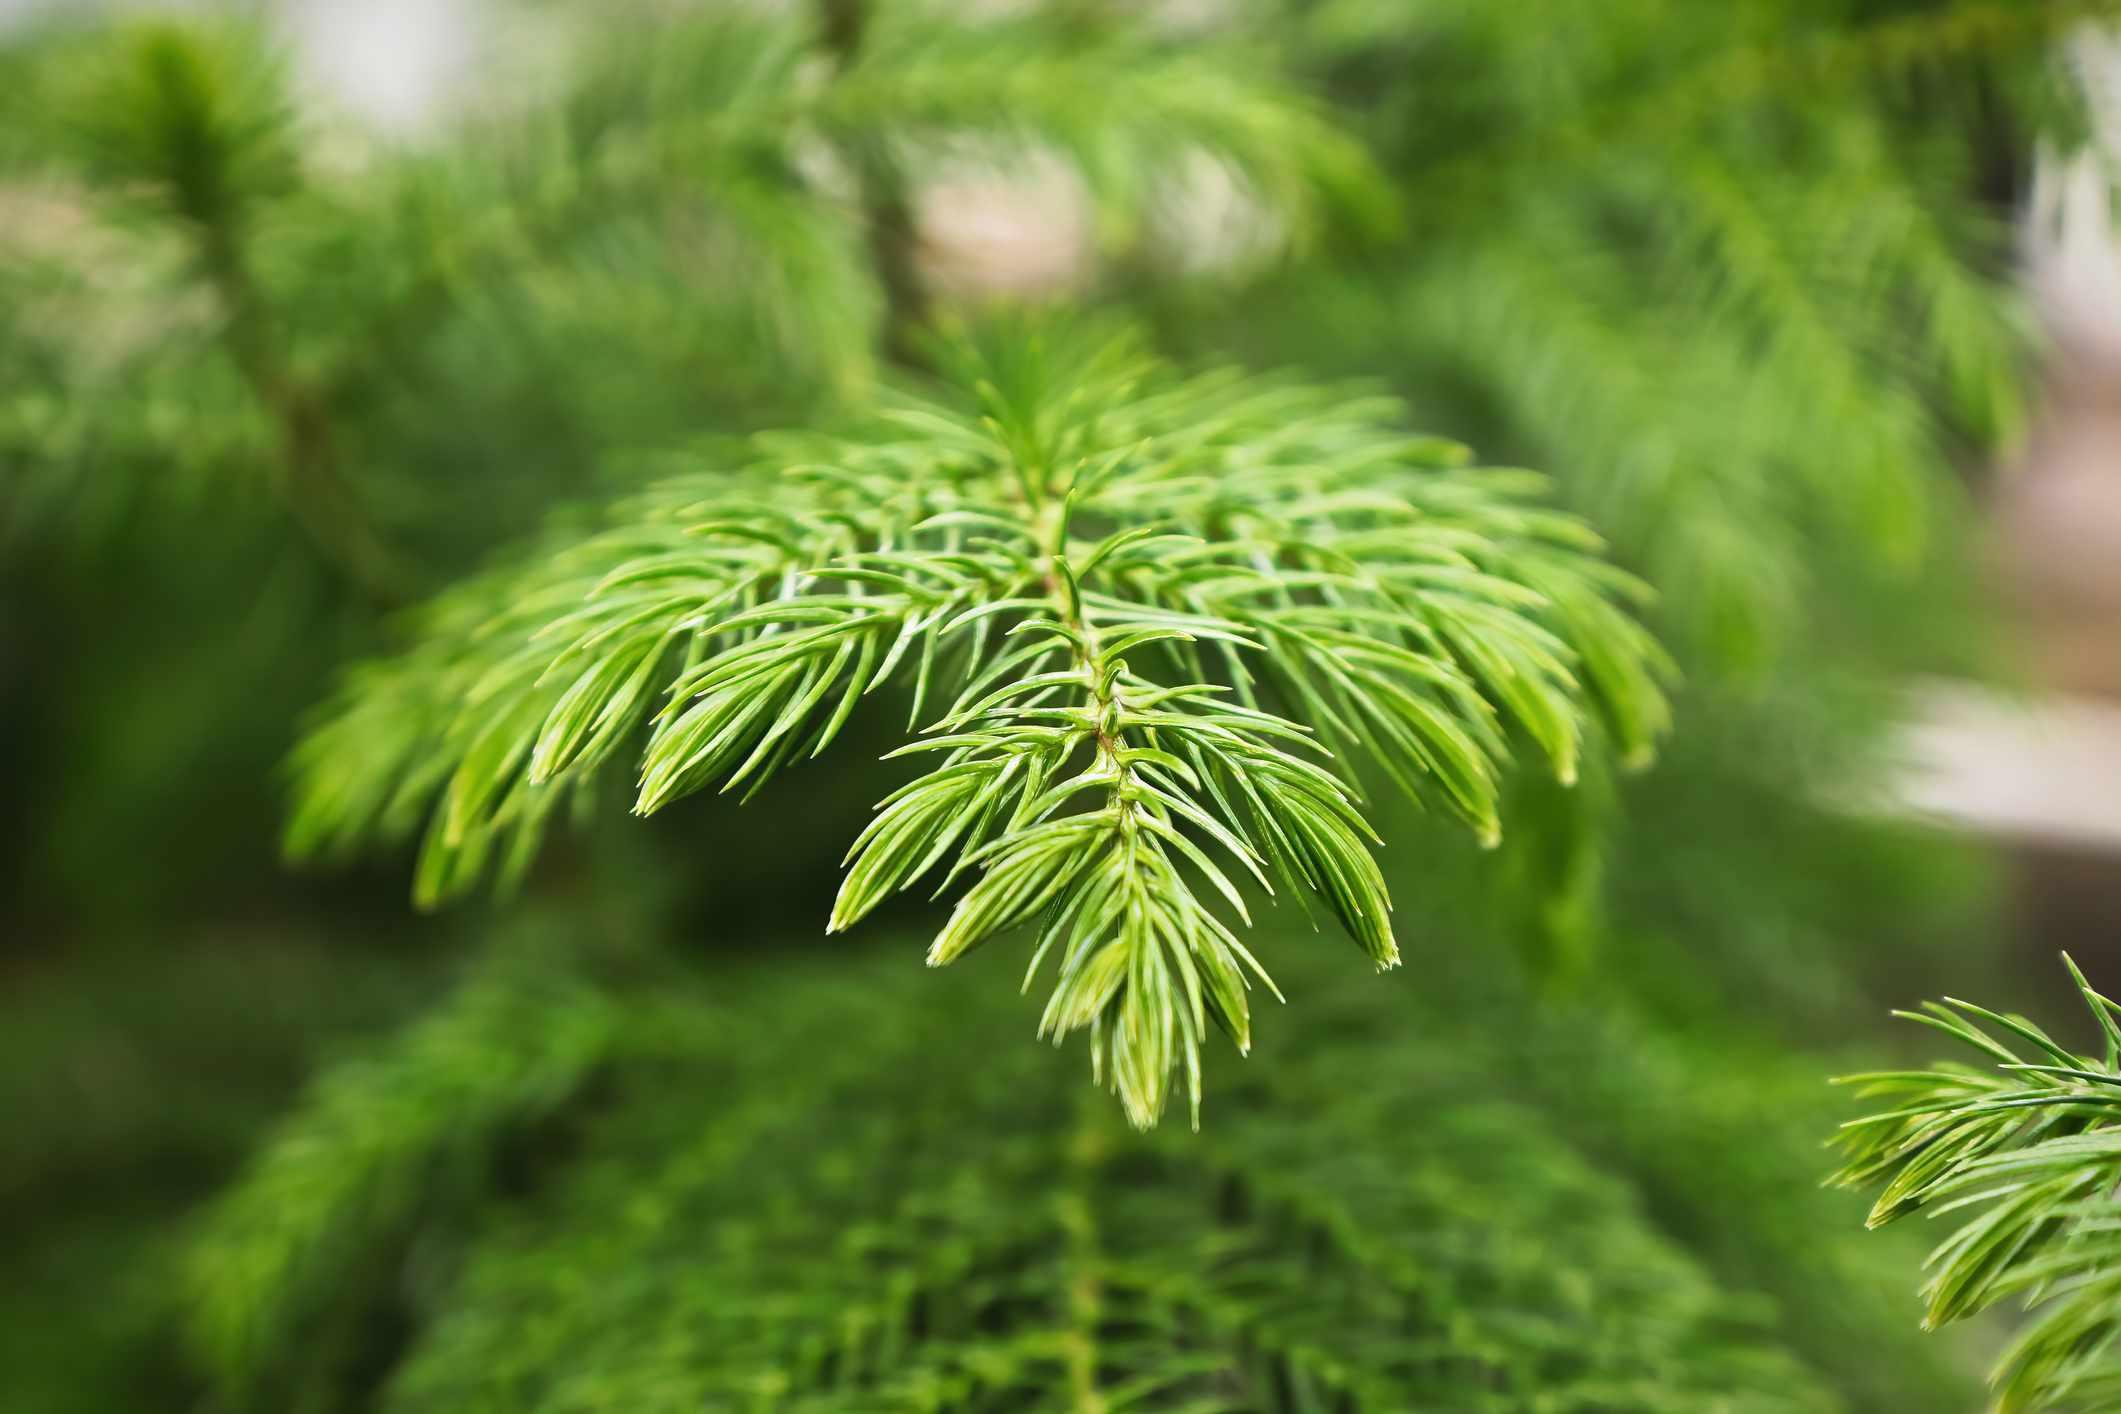 Detailed shot of Norfolk Island Pine needles.